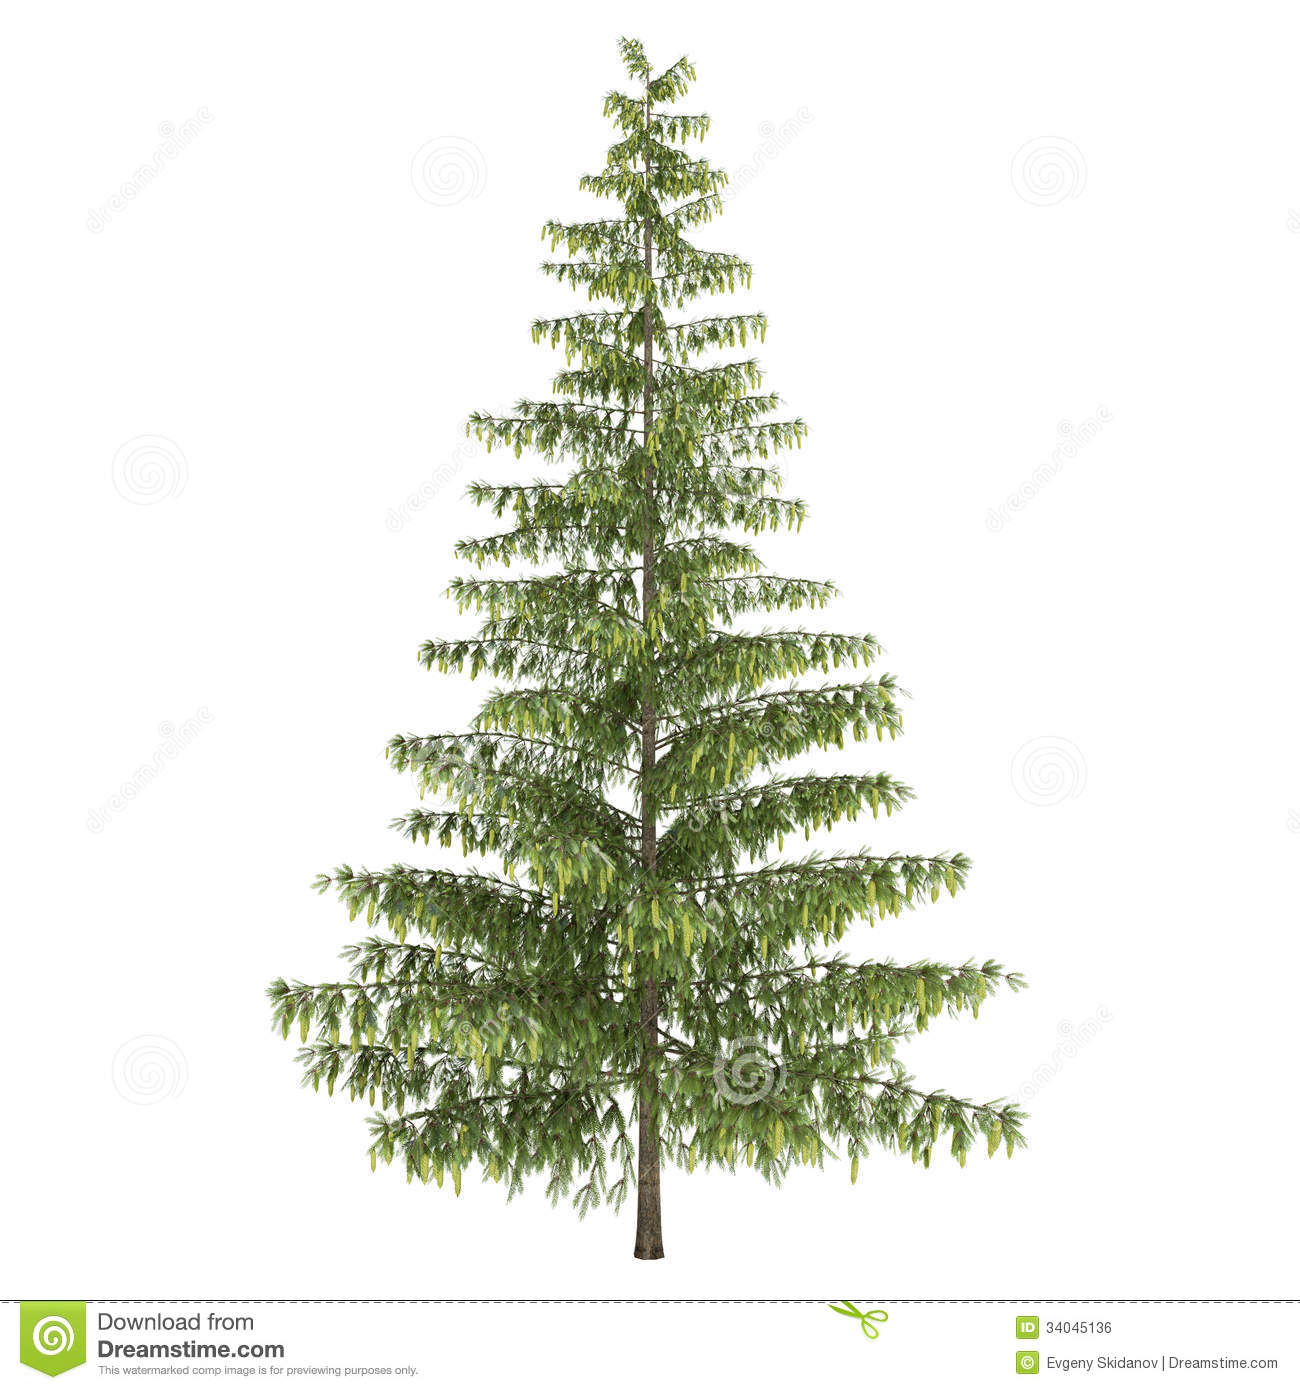 Tall pine tree clipart.